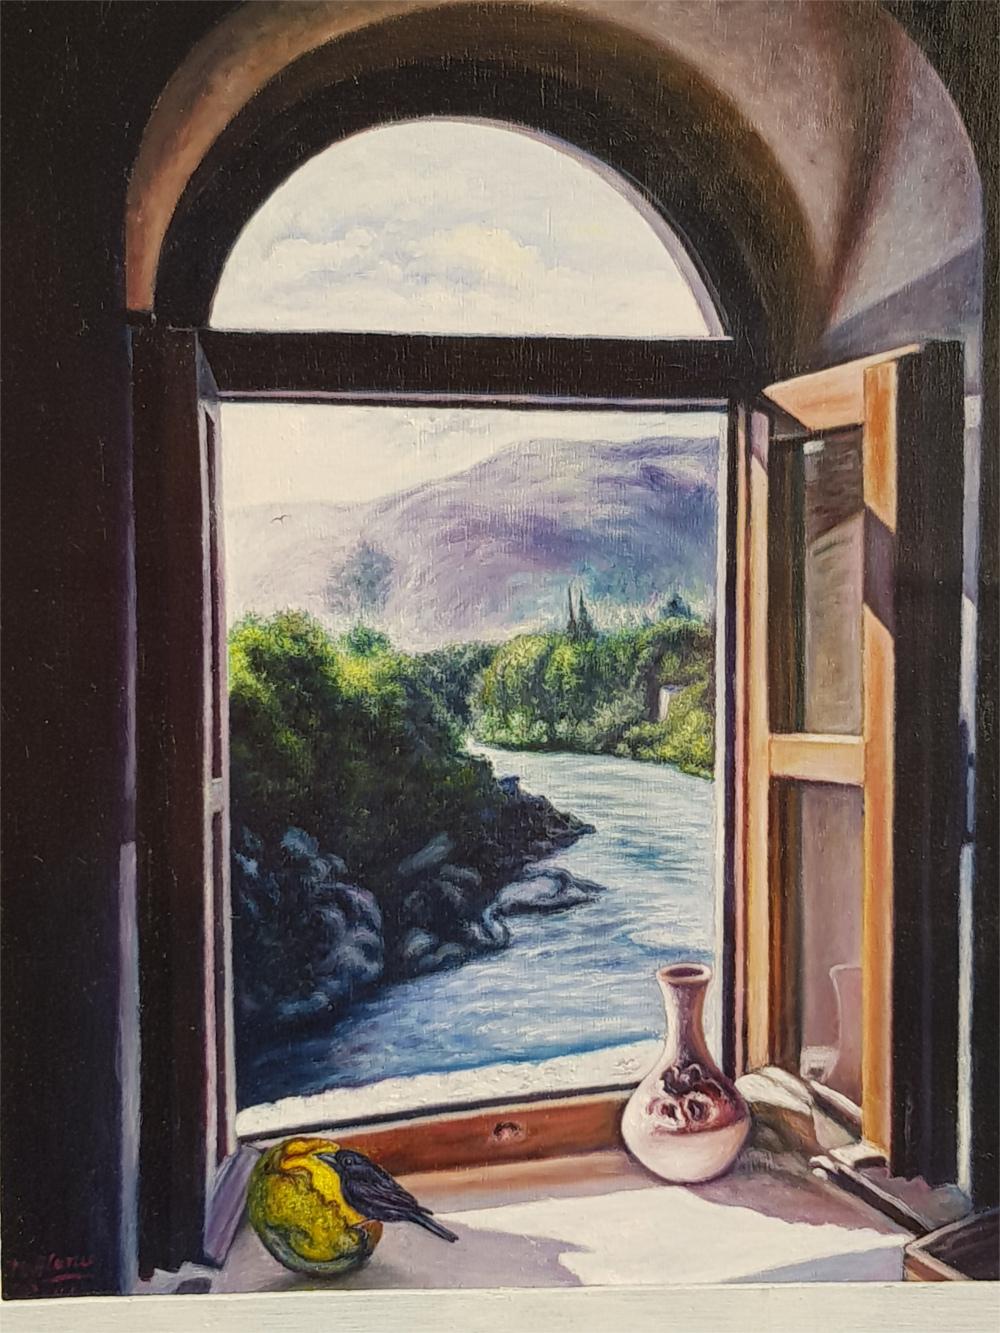 ventana al rio